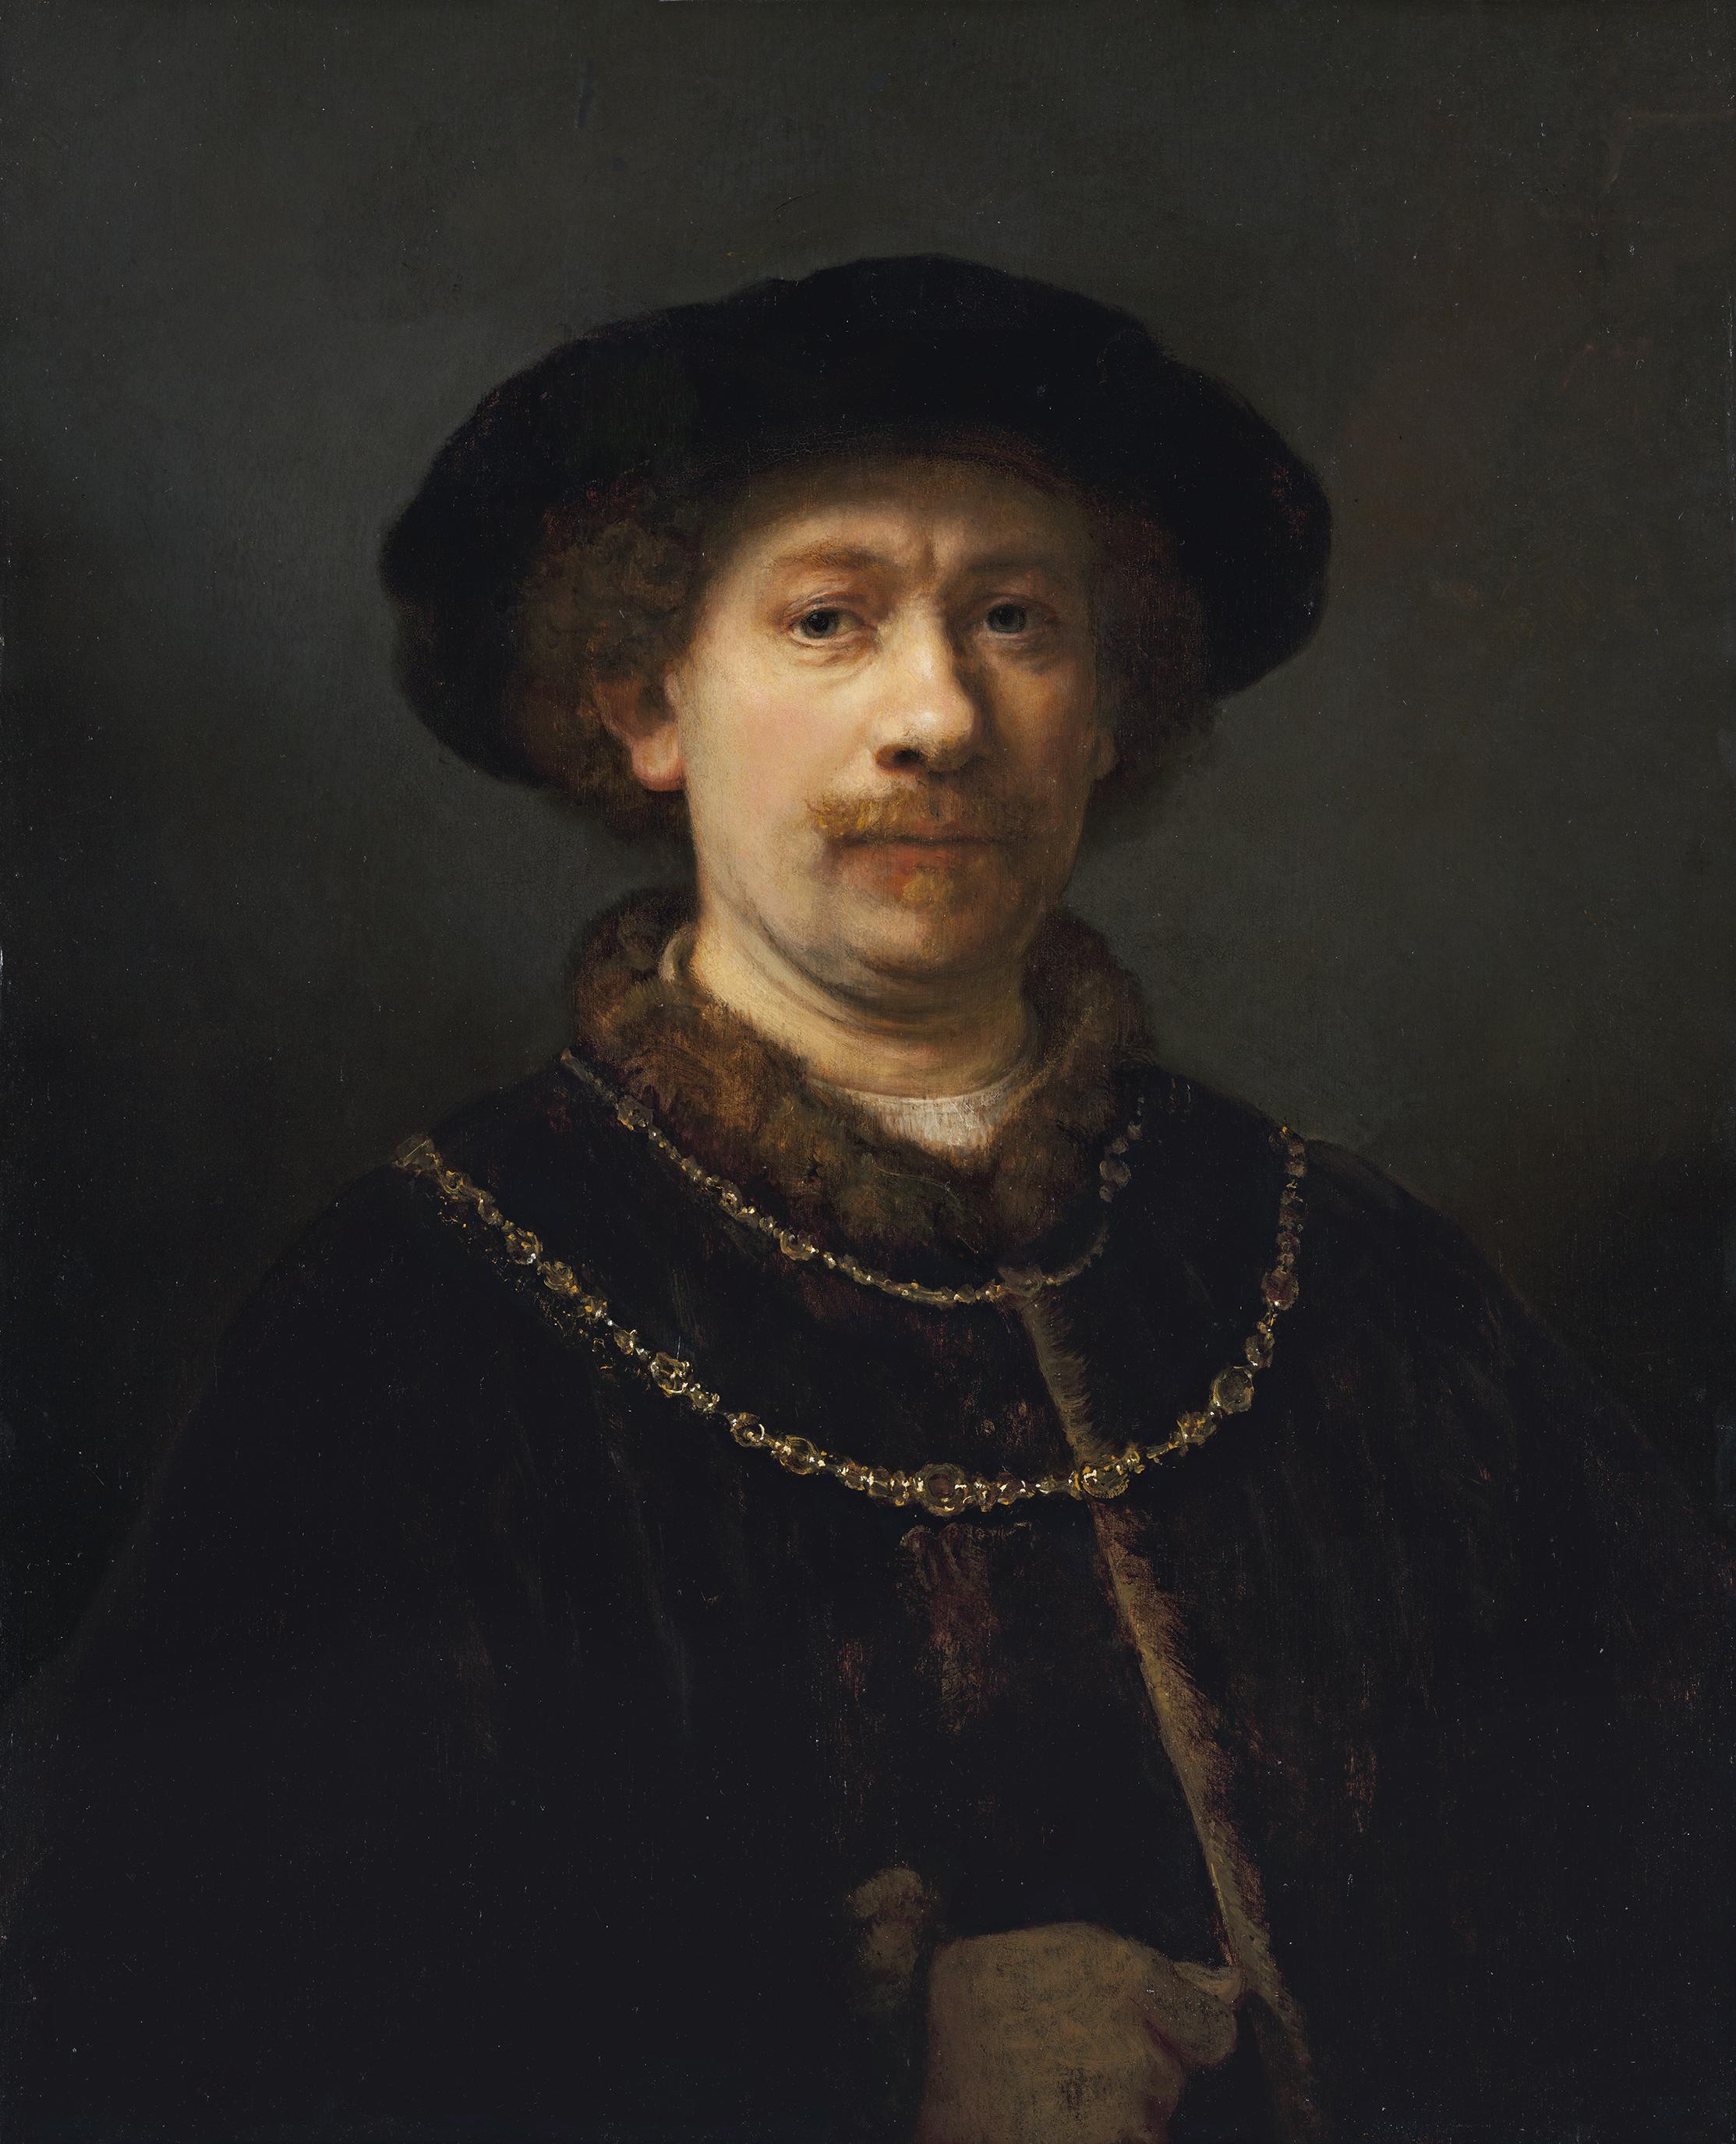 Rembrandt Harmensz van Rijn | Self Portrait in a Velvet Cap with Plume